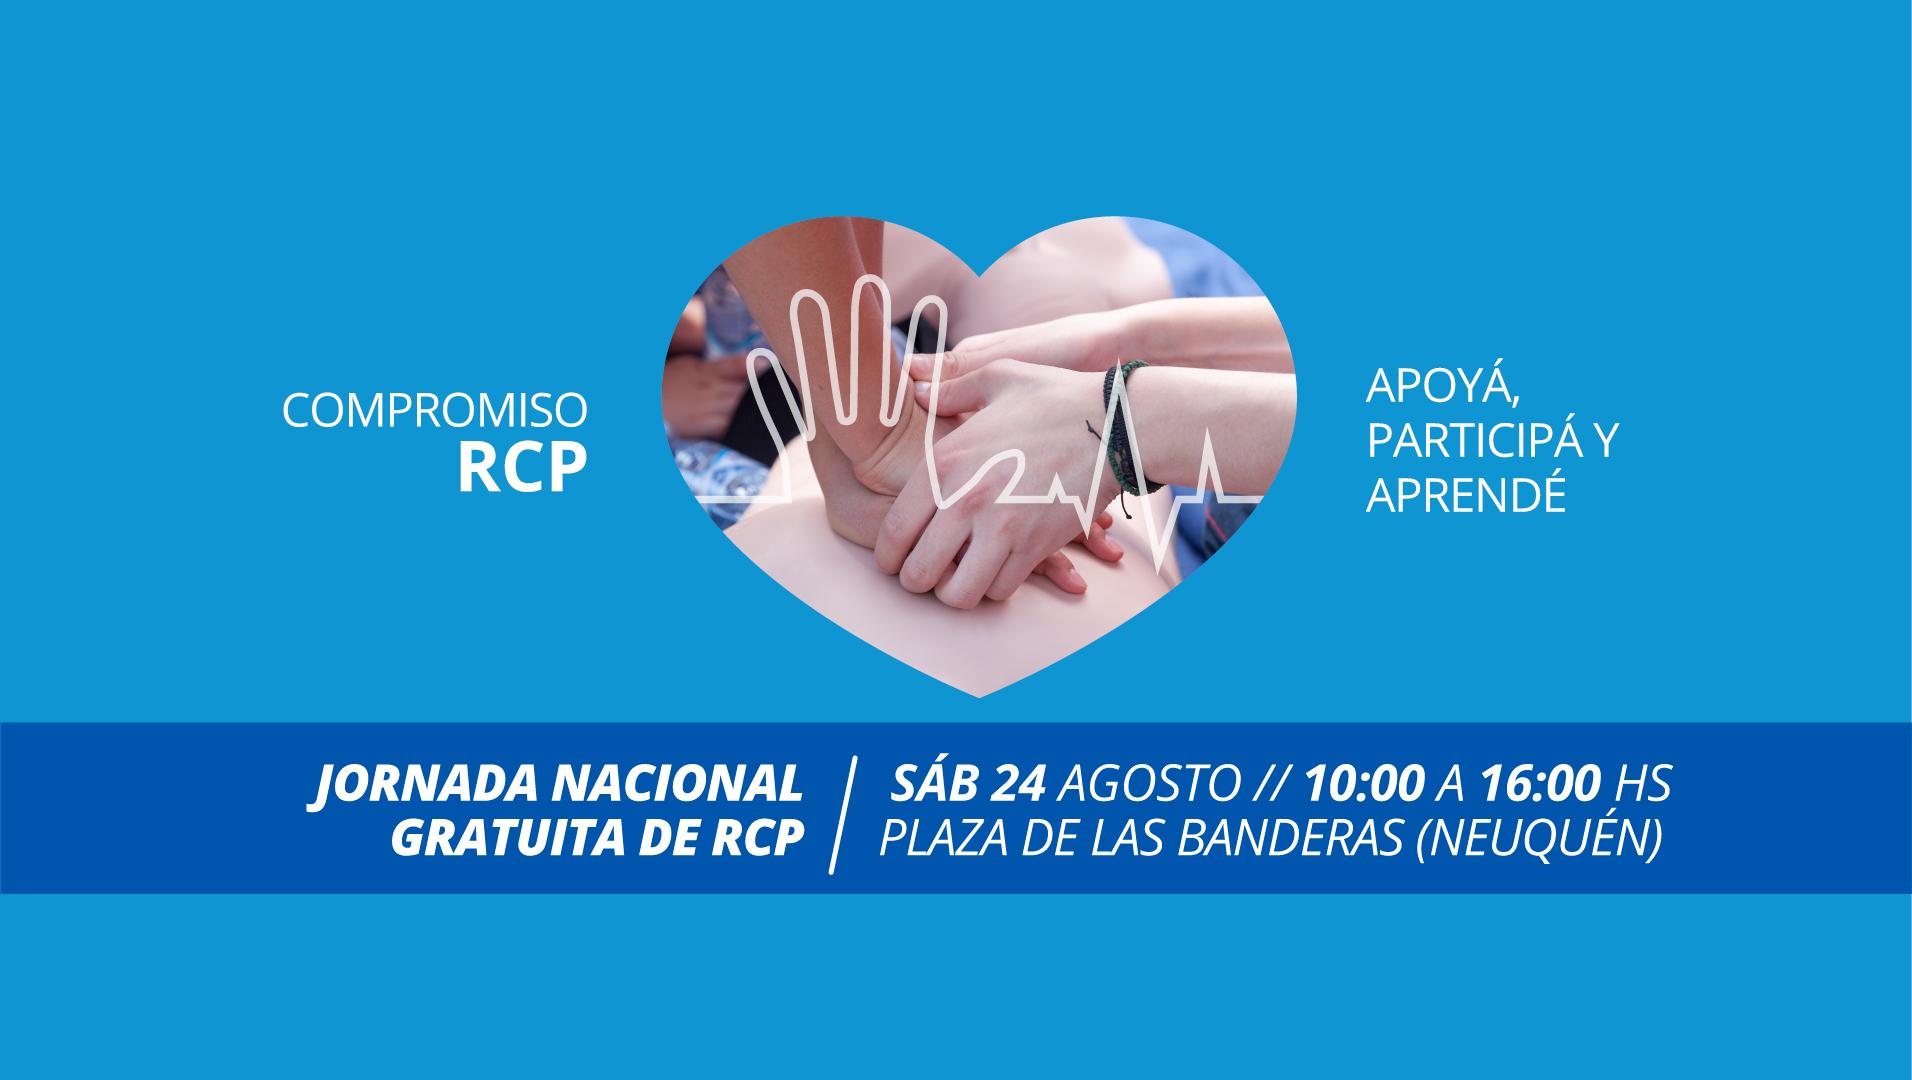 Jornada Nacional de RCP